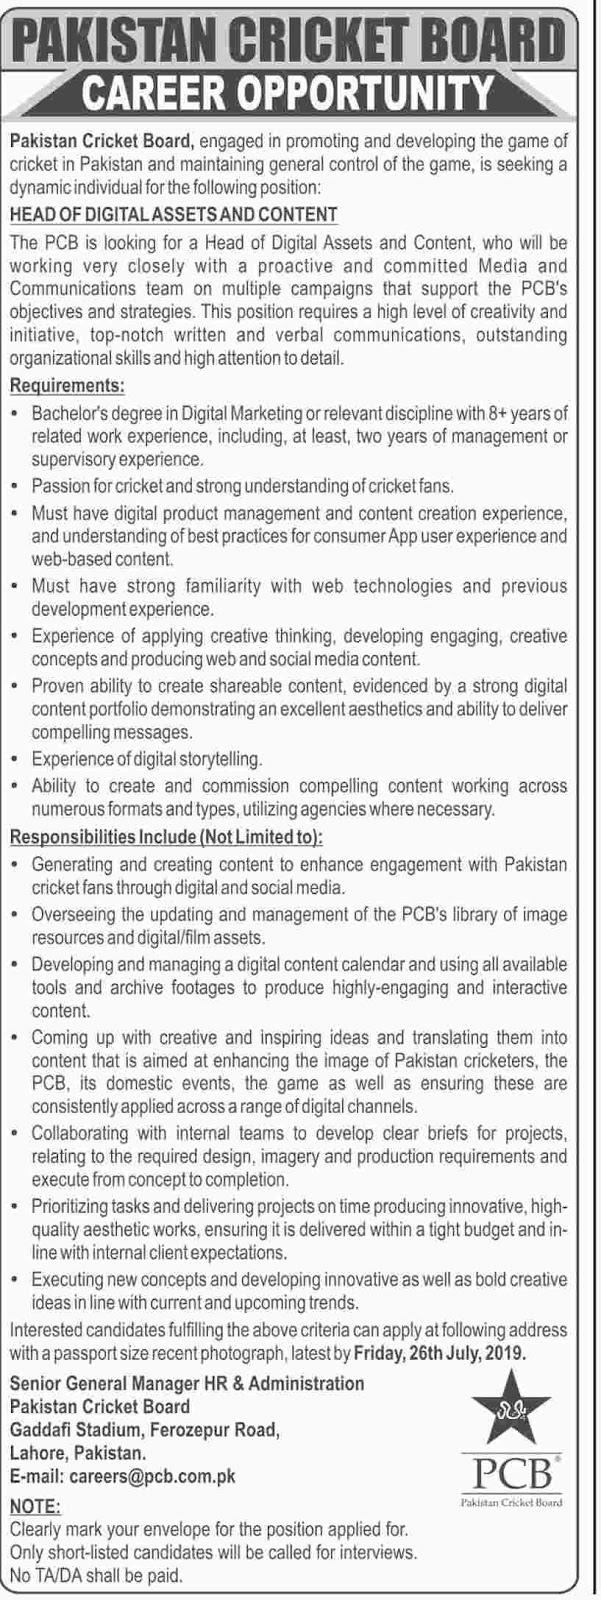 ➨ #Jobs - #Career_Opportunities - #Jobs - Jobs in Pakistan Cricket Board - Last date 26 July 2019